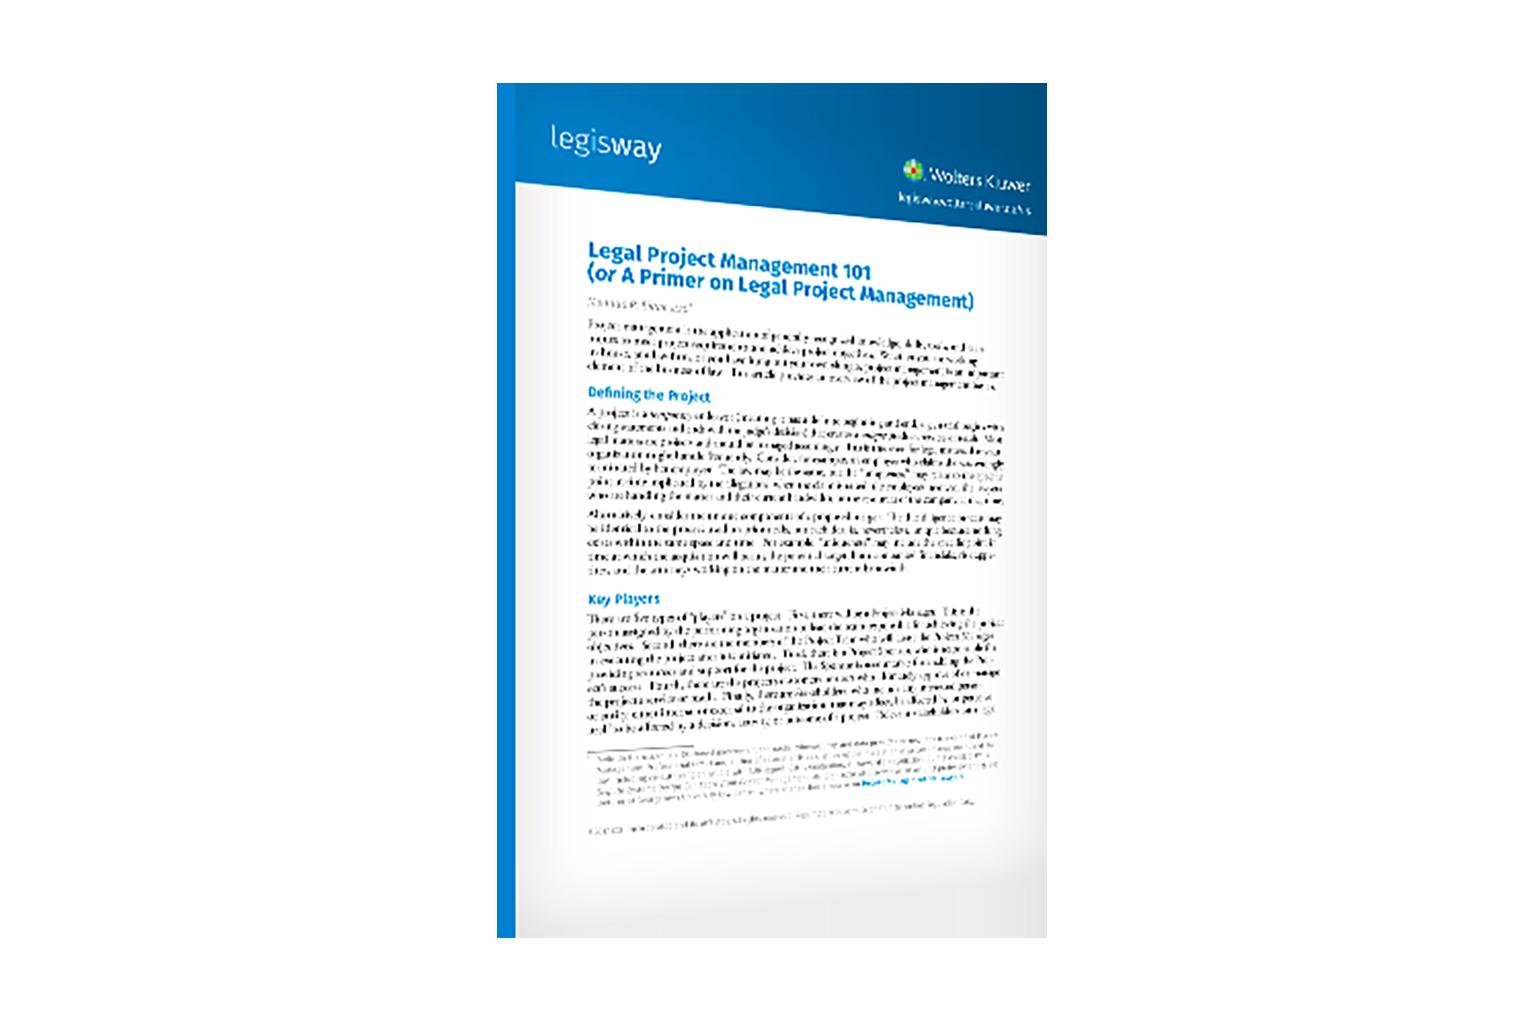 Legisway-Legal-Project-Management-Whitepaper-EN-1536x1024